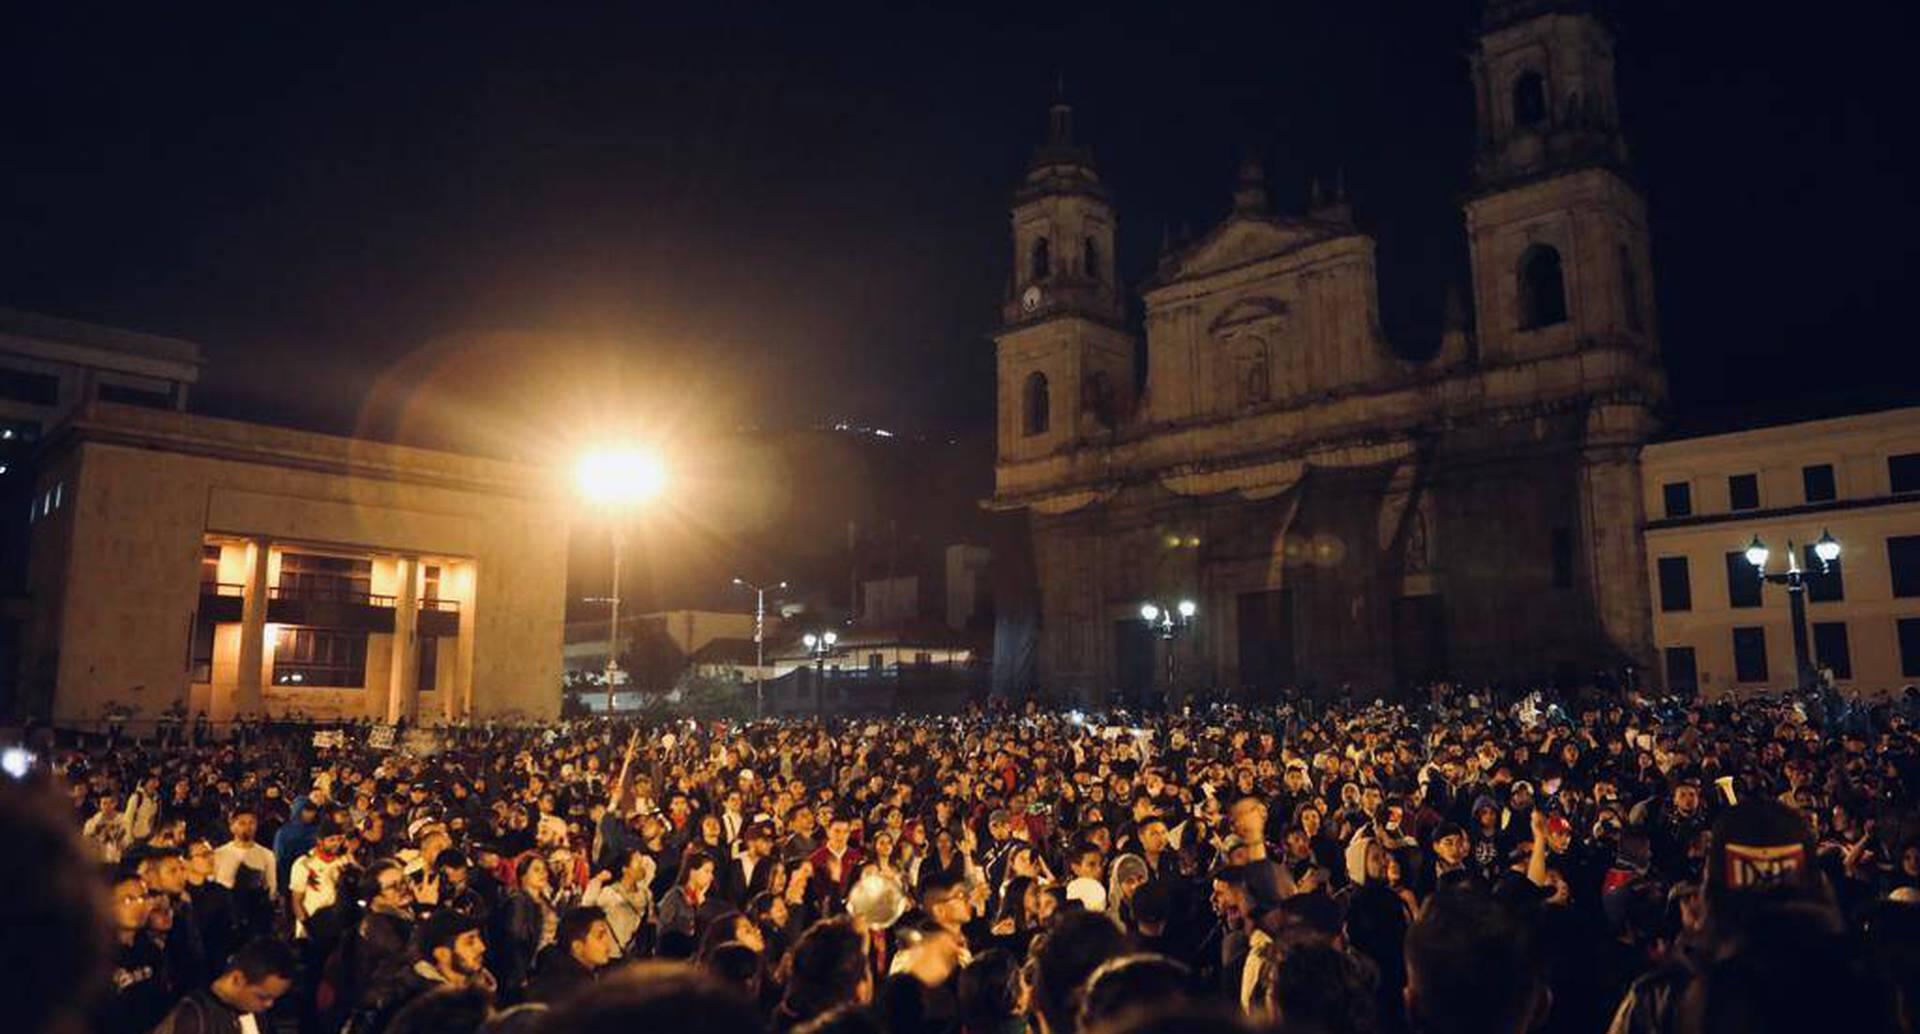 Este sábado continuaron las protestas. Miles de personas se reunieron en la Plaza de Bolívar.